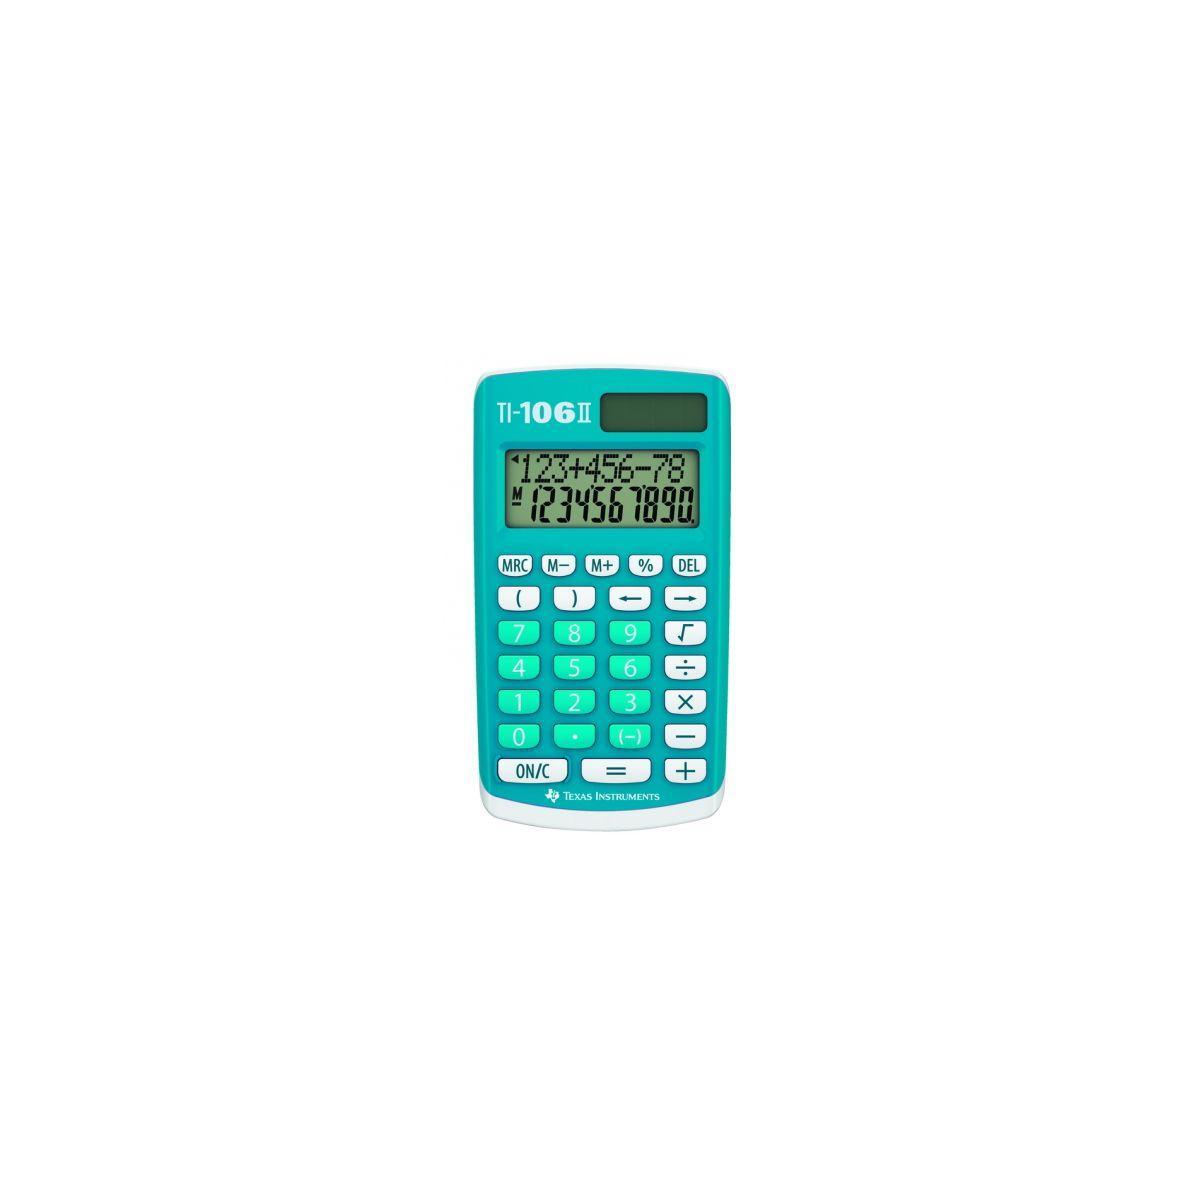 Calculatrice standard texas instruments ti-106 ii - 2% de remise imm�diate avec le code : deal2 (photo)